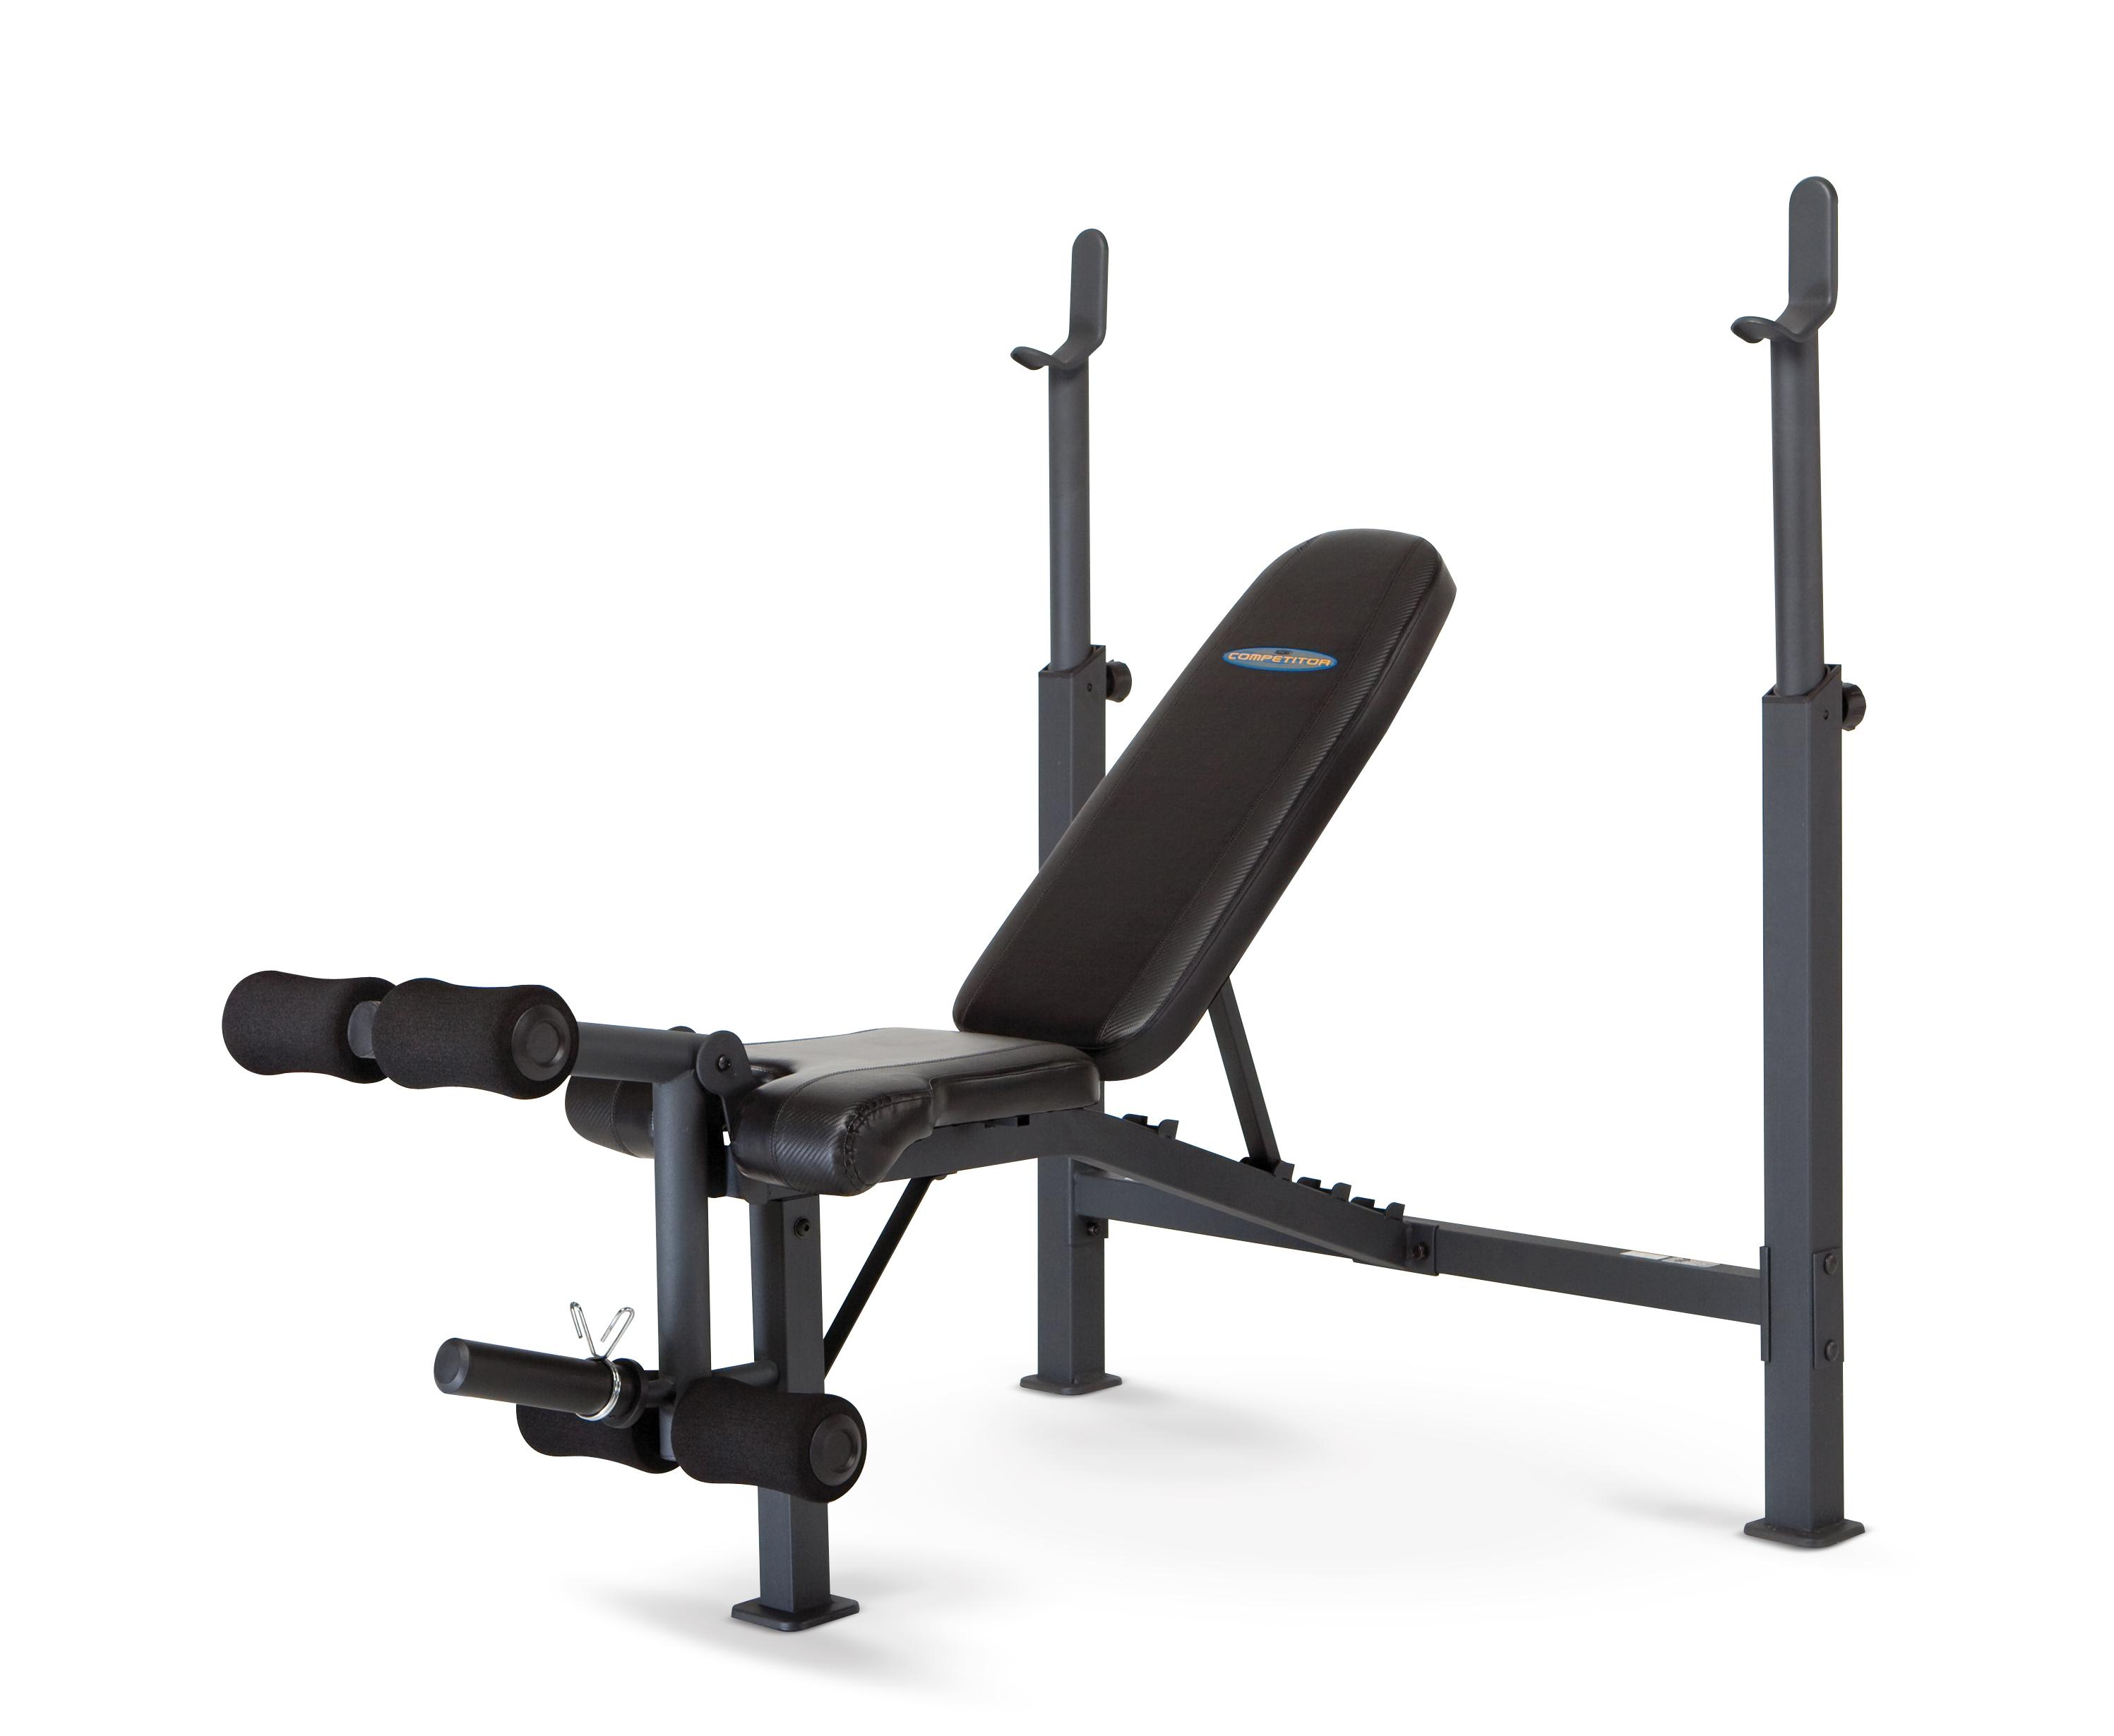 gym bench press chair mid century modern rocking uk weight incline olympic bar leg adjustable